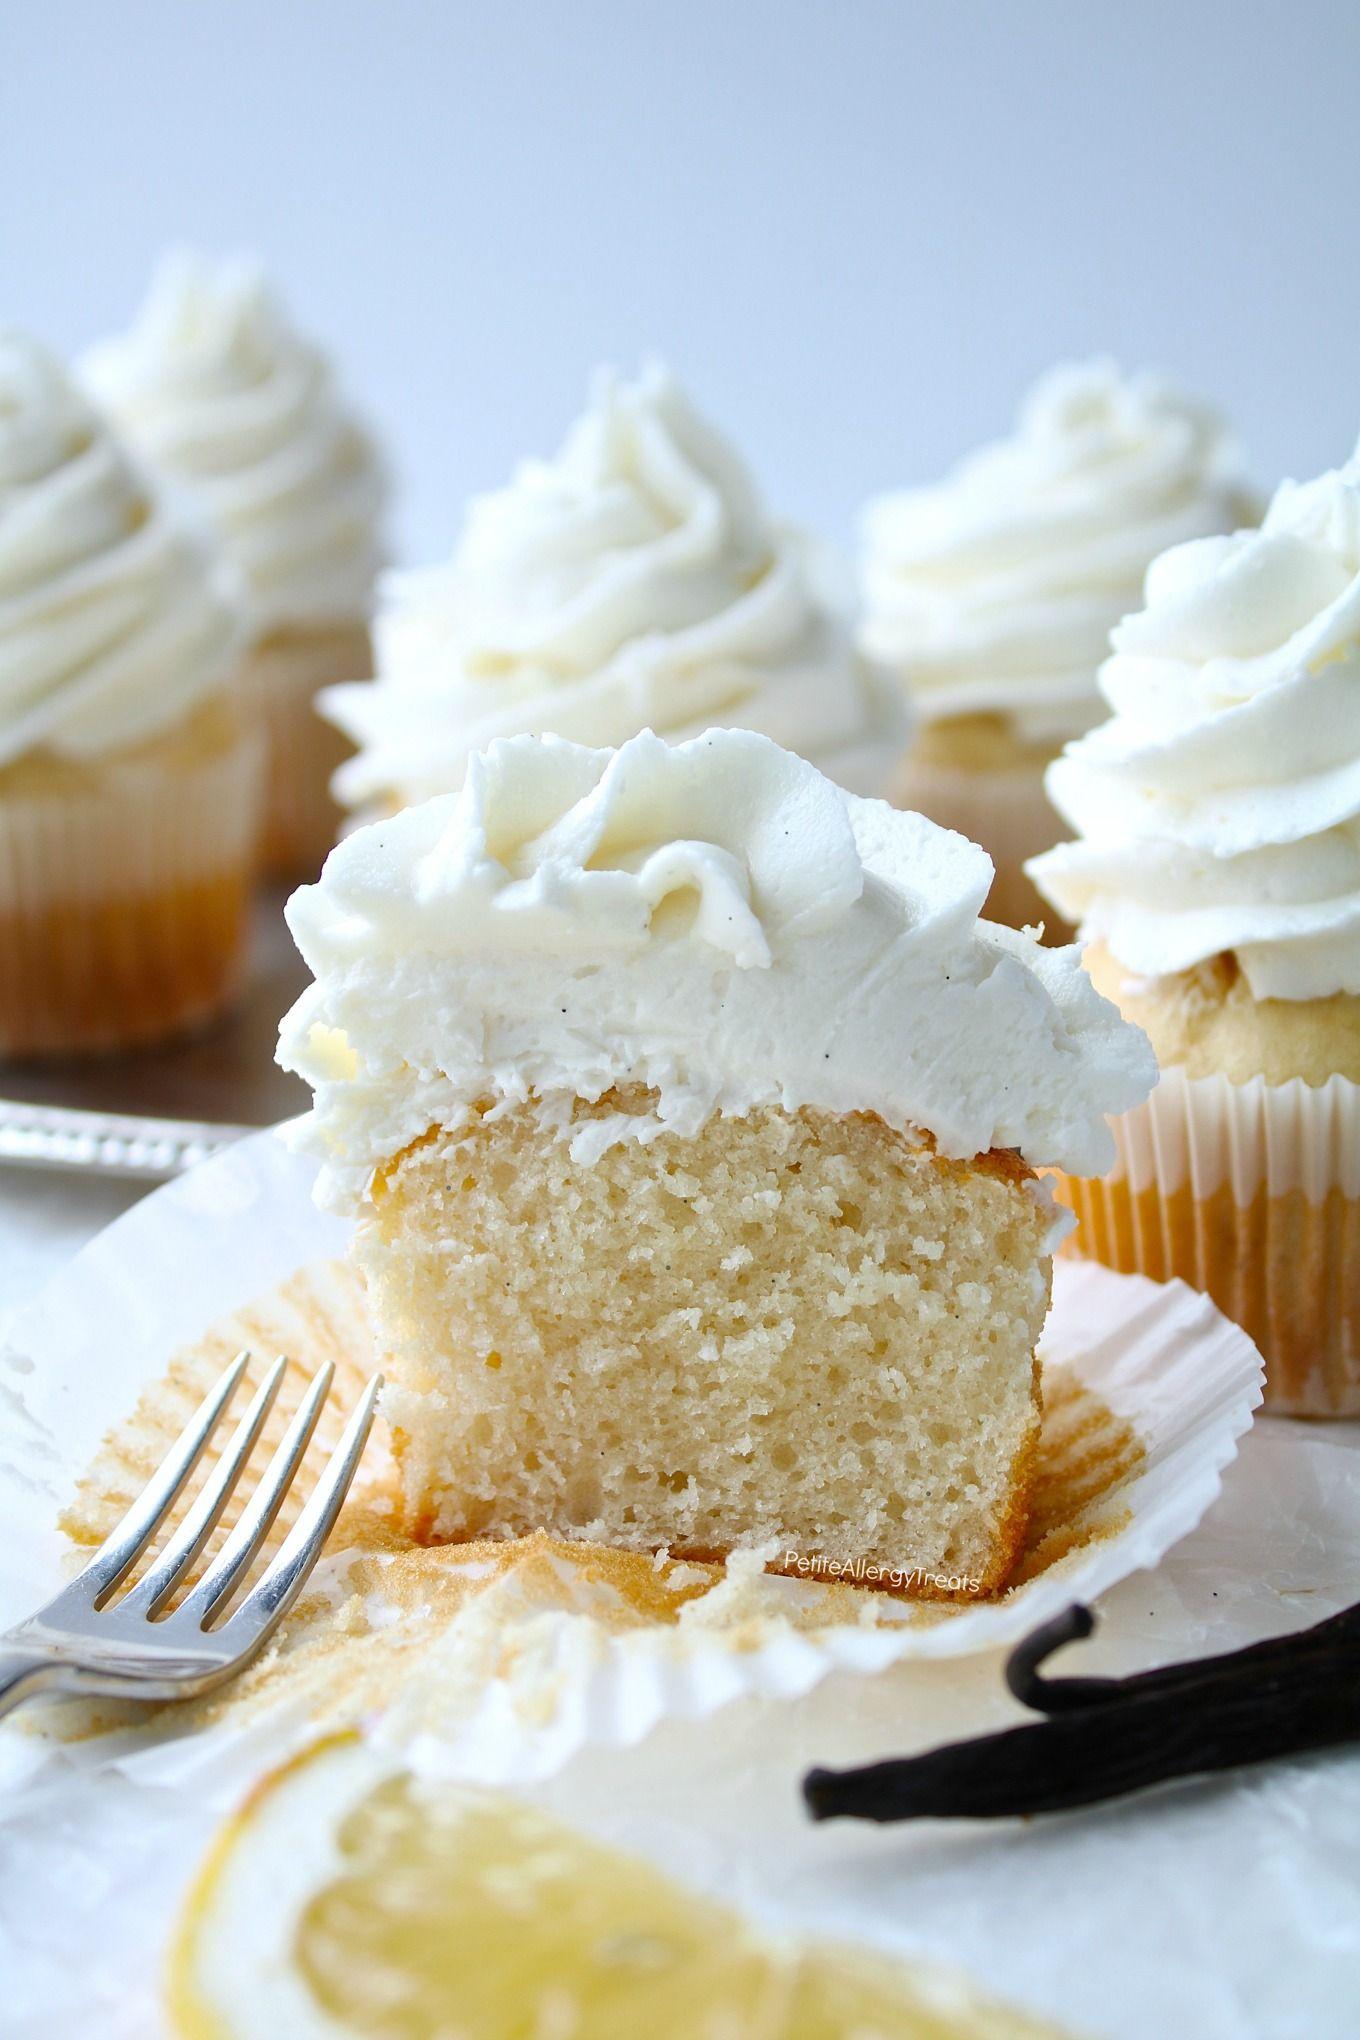 Vegan Gluten Free Vanilla Cupcakes & Allergy Amulet